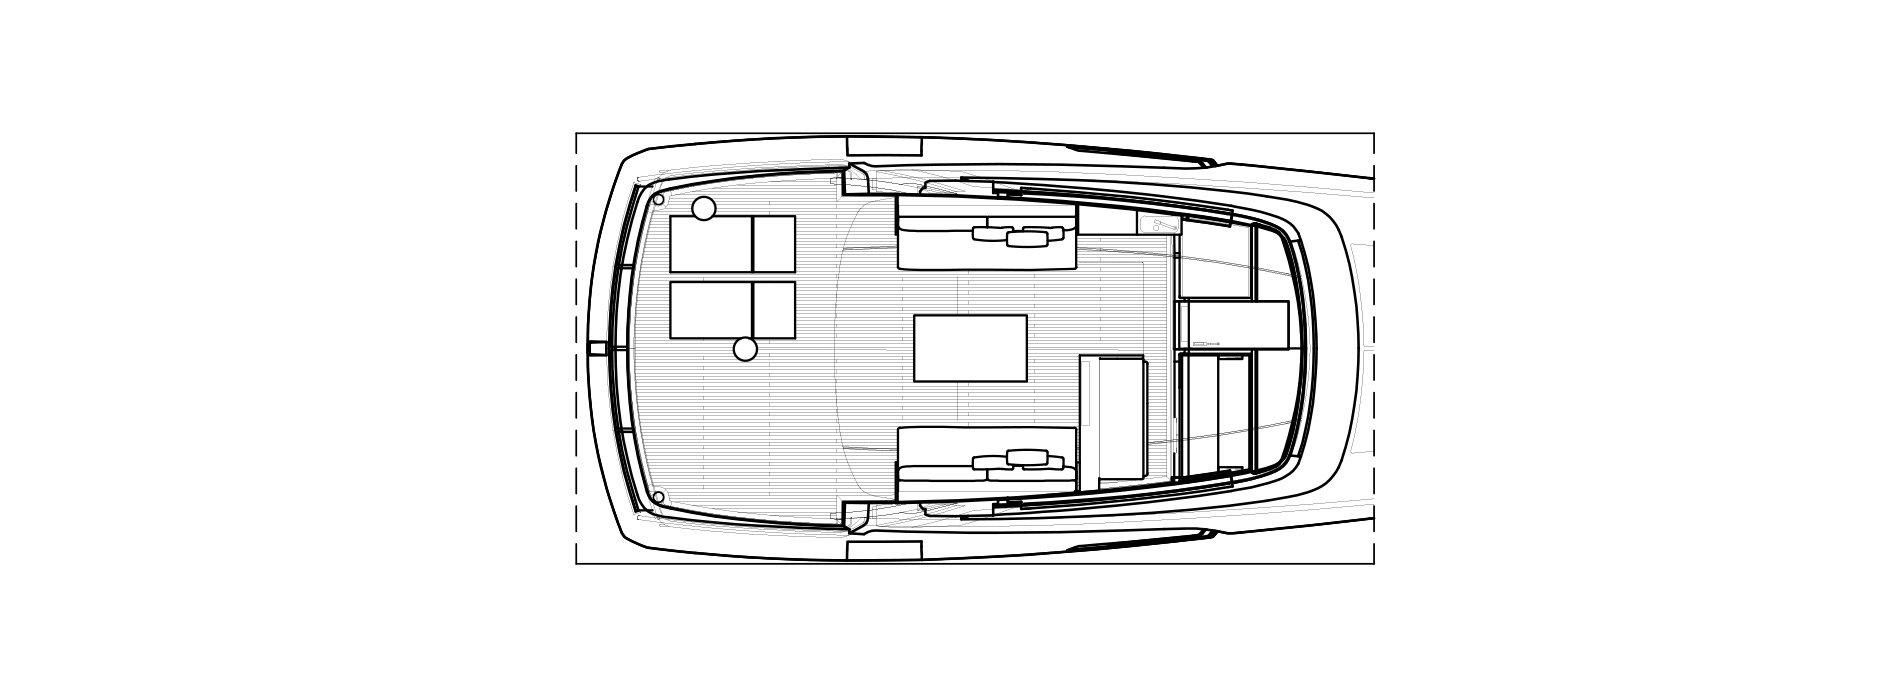 Sanlorenzo Yachts SX88 Детали версия Lissoni